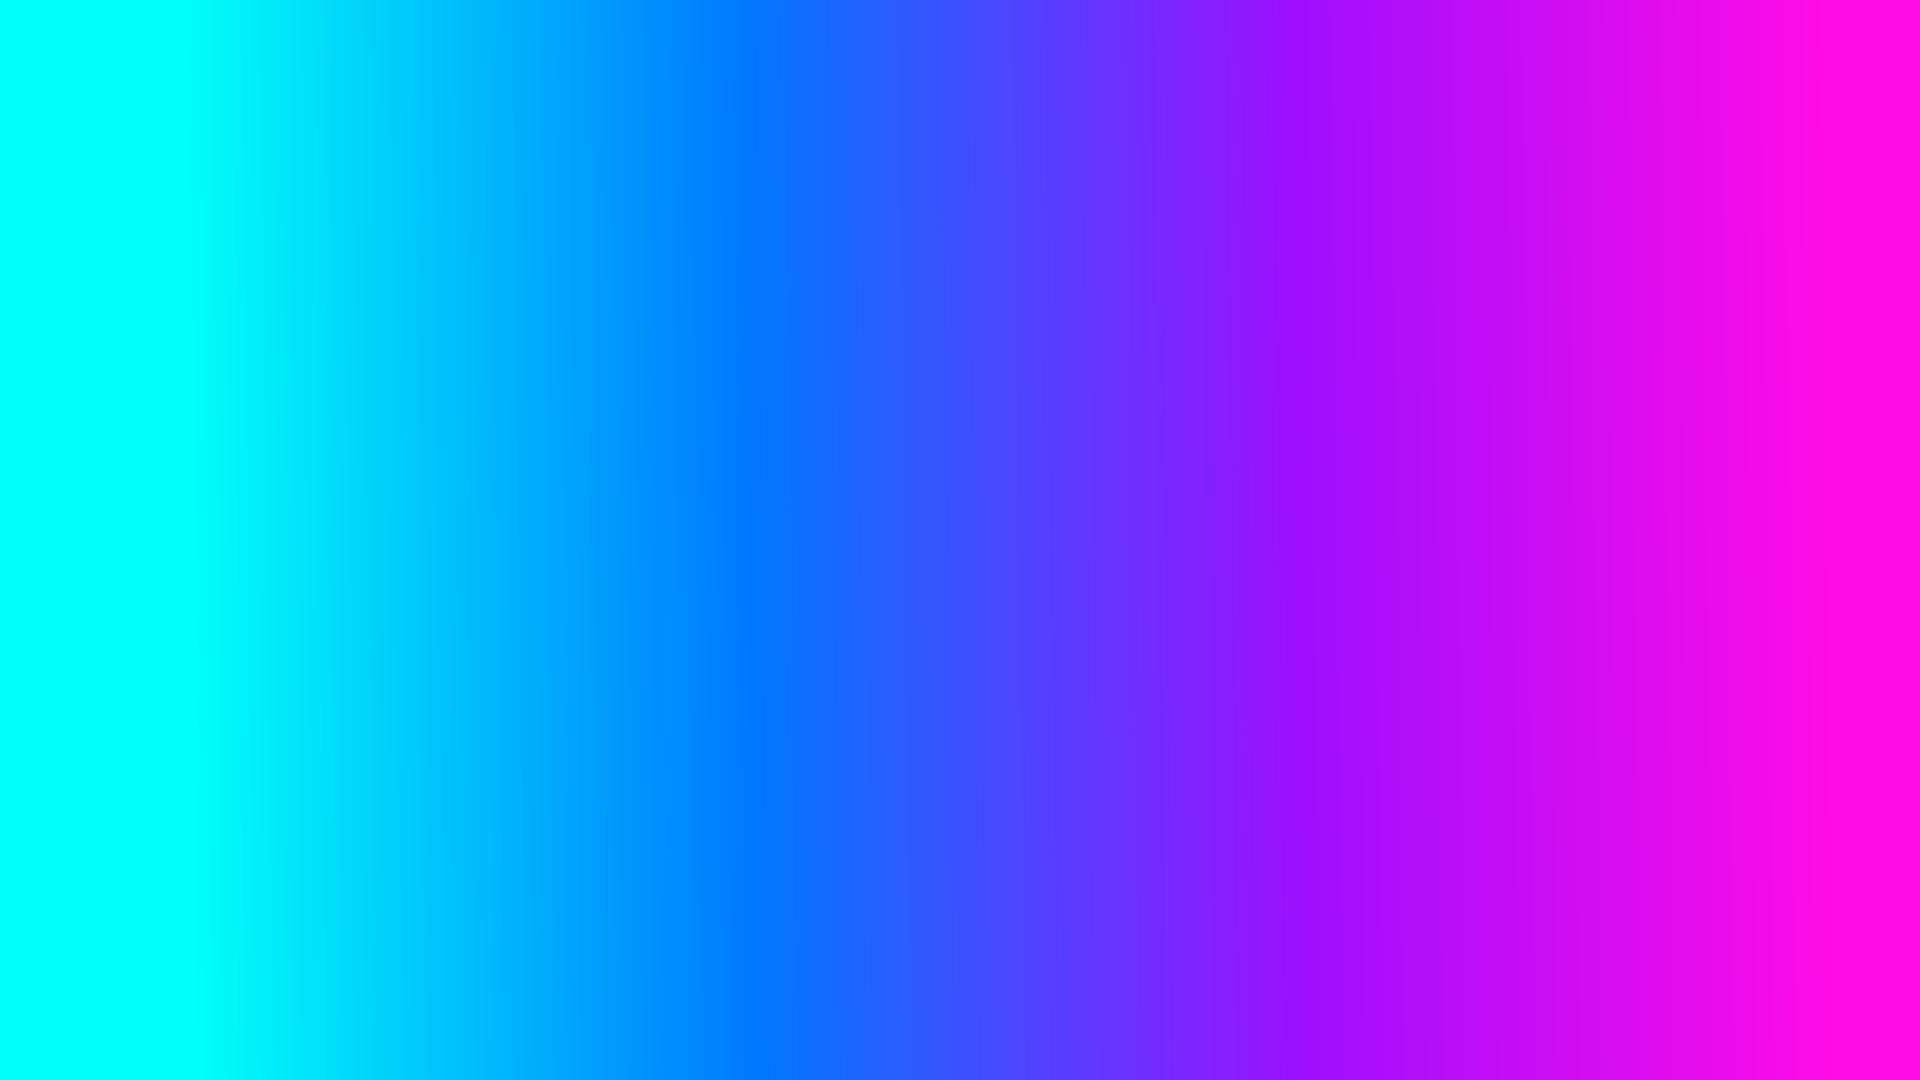 Colors of Galactic Moonlight Gradient